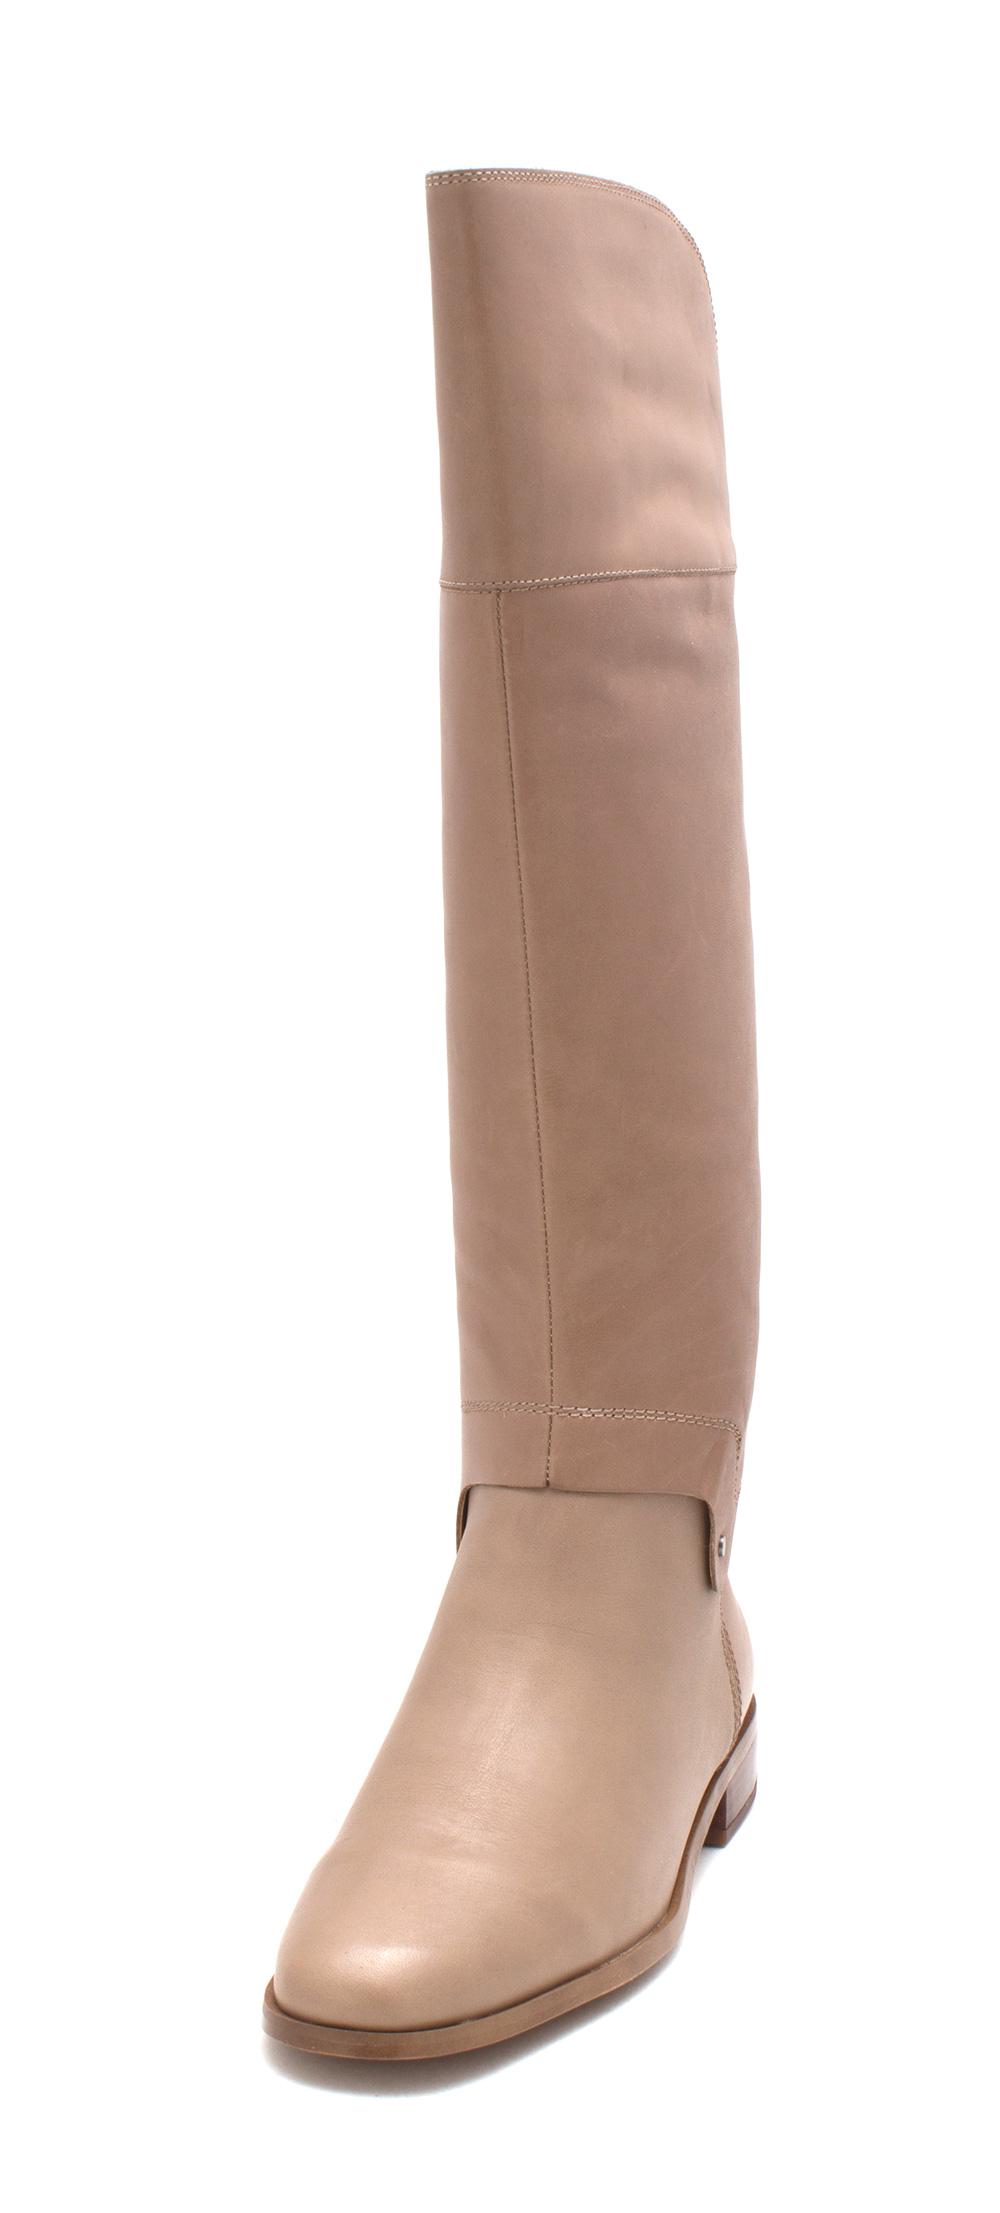 Franco Sarto Womens Roxie High Leather Closed Toe Knee High Roxie Fashion Boots 85b57f